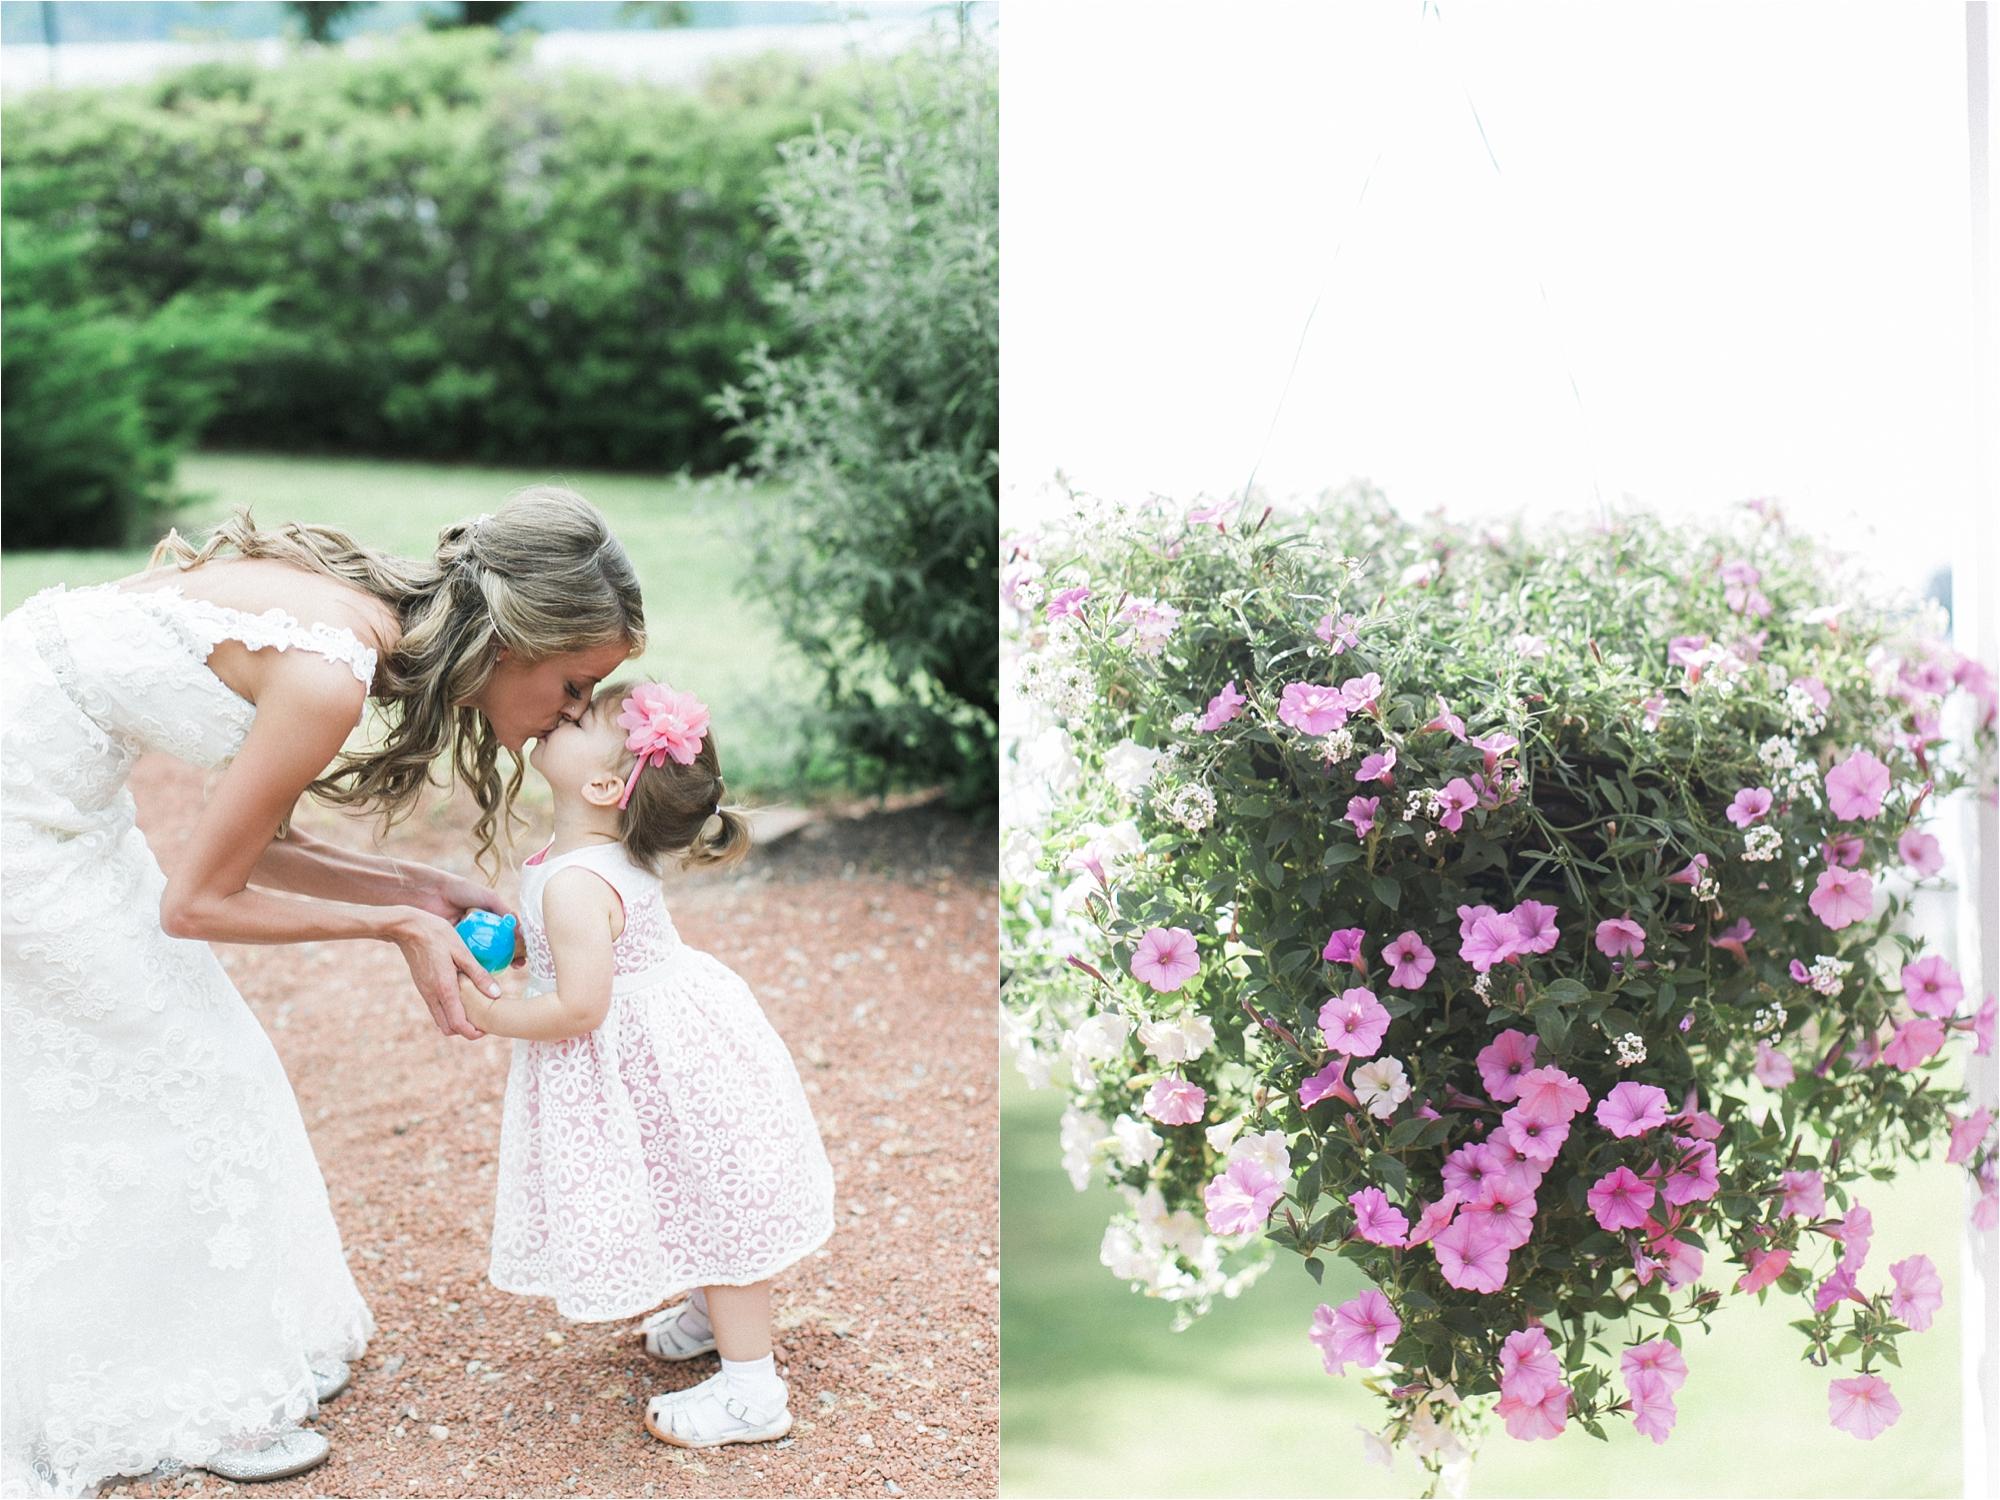 stephanie-yonce-boathouse-sunday-park-virginia-wedding-photo-034.JPG